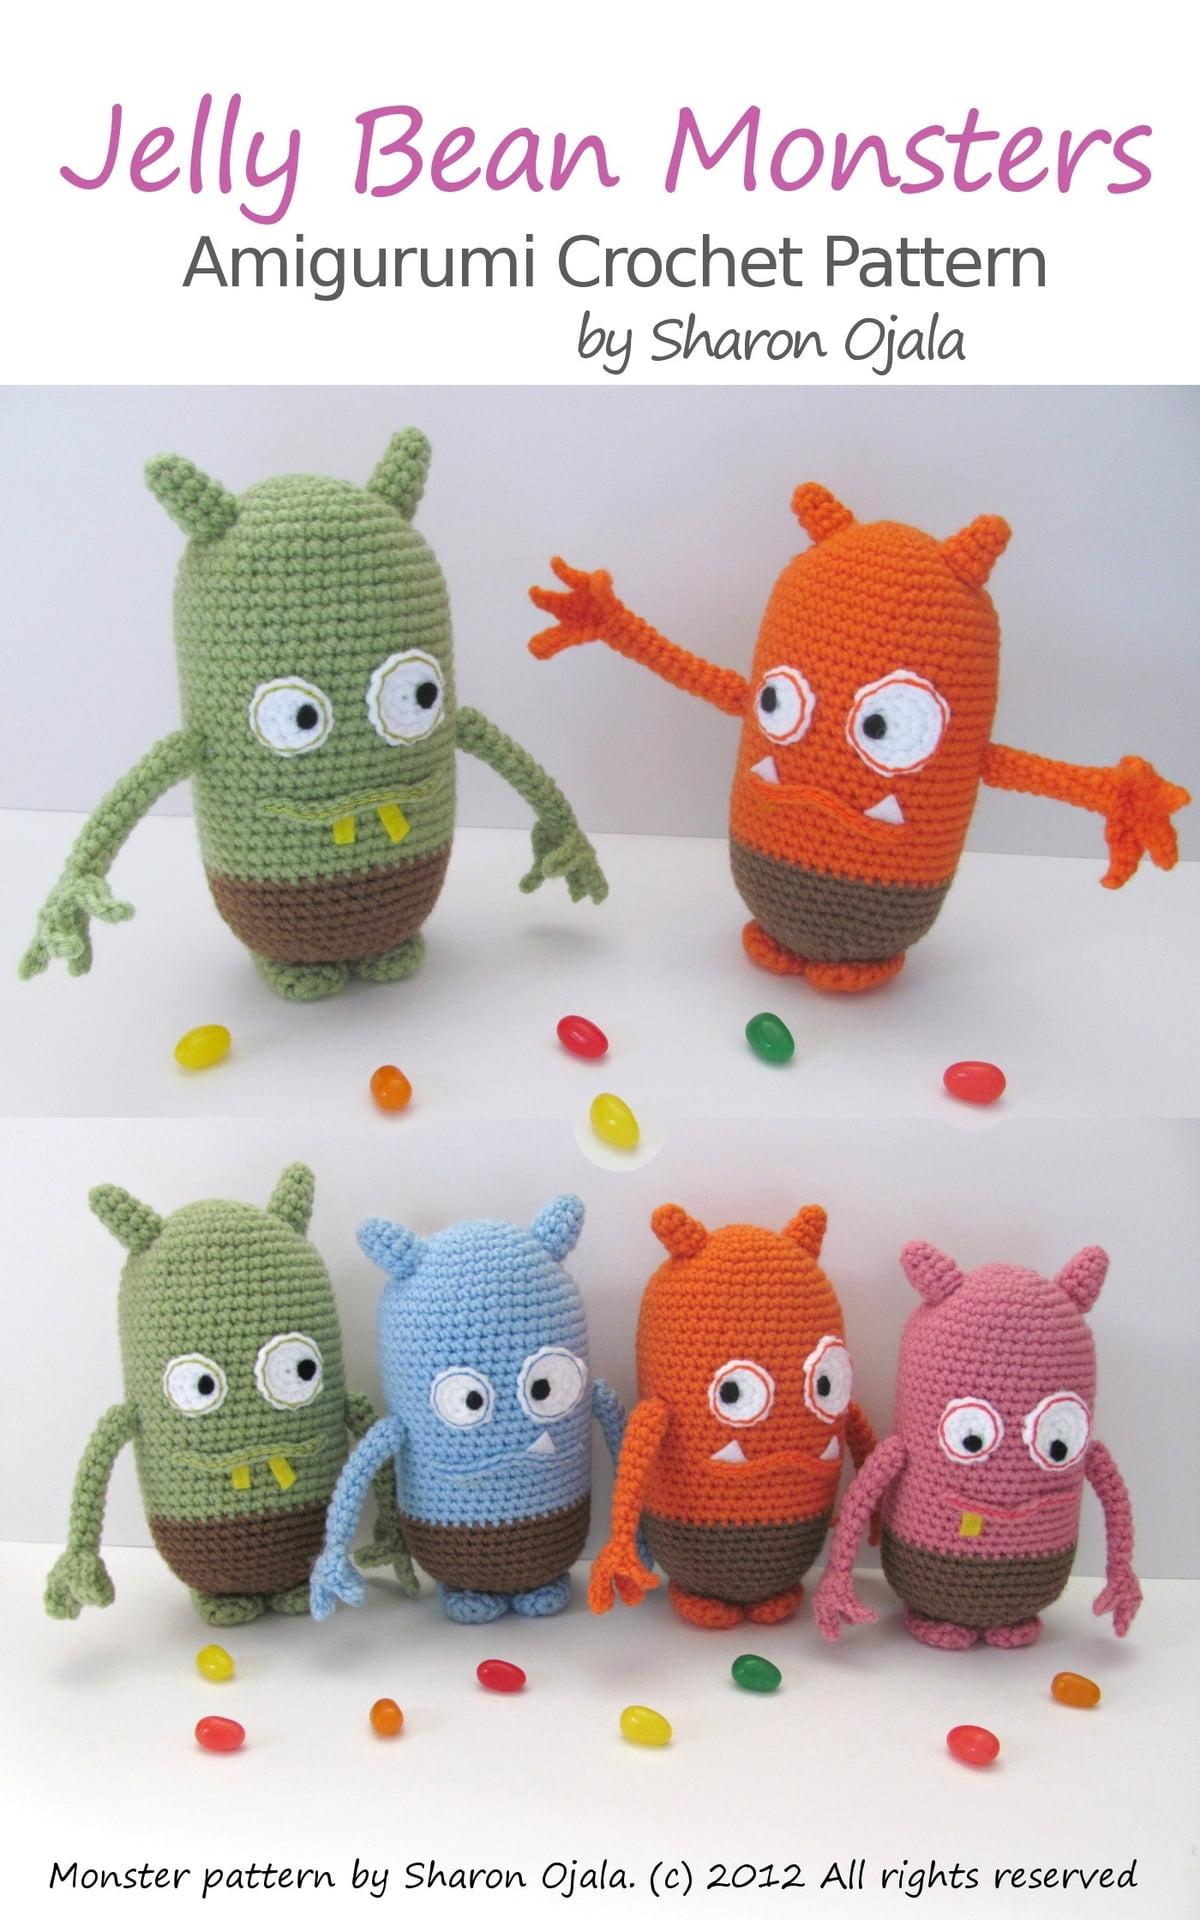 Jelly Bean Monsters Amigurumi Crochet Pattern Ebook By Sharon Ojala